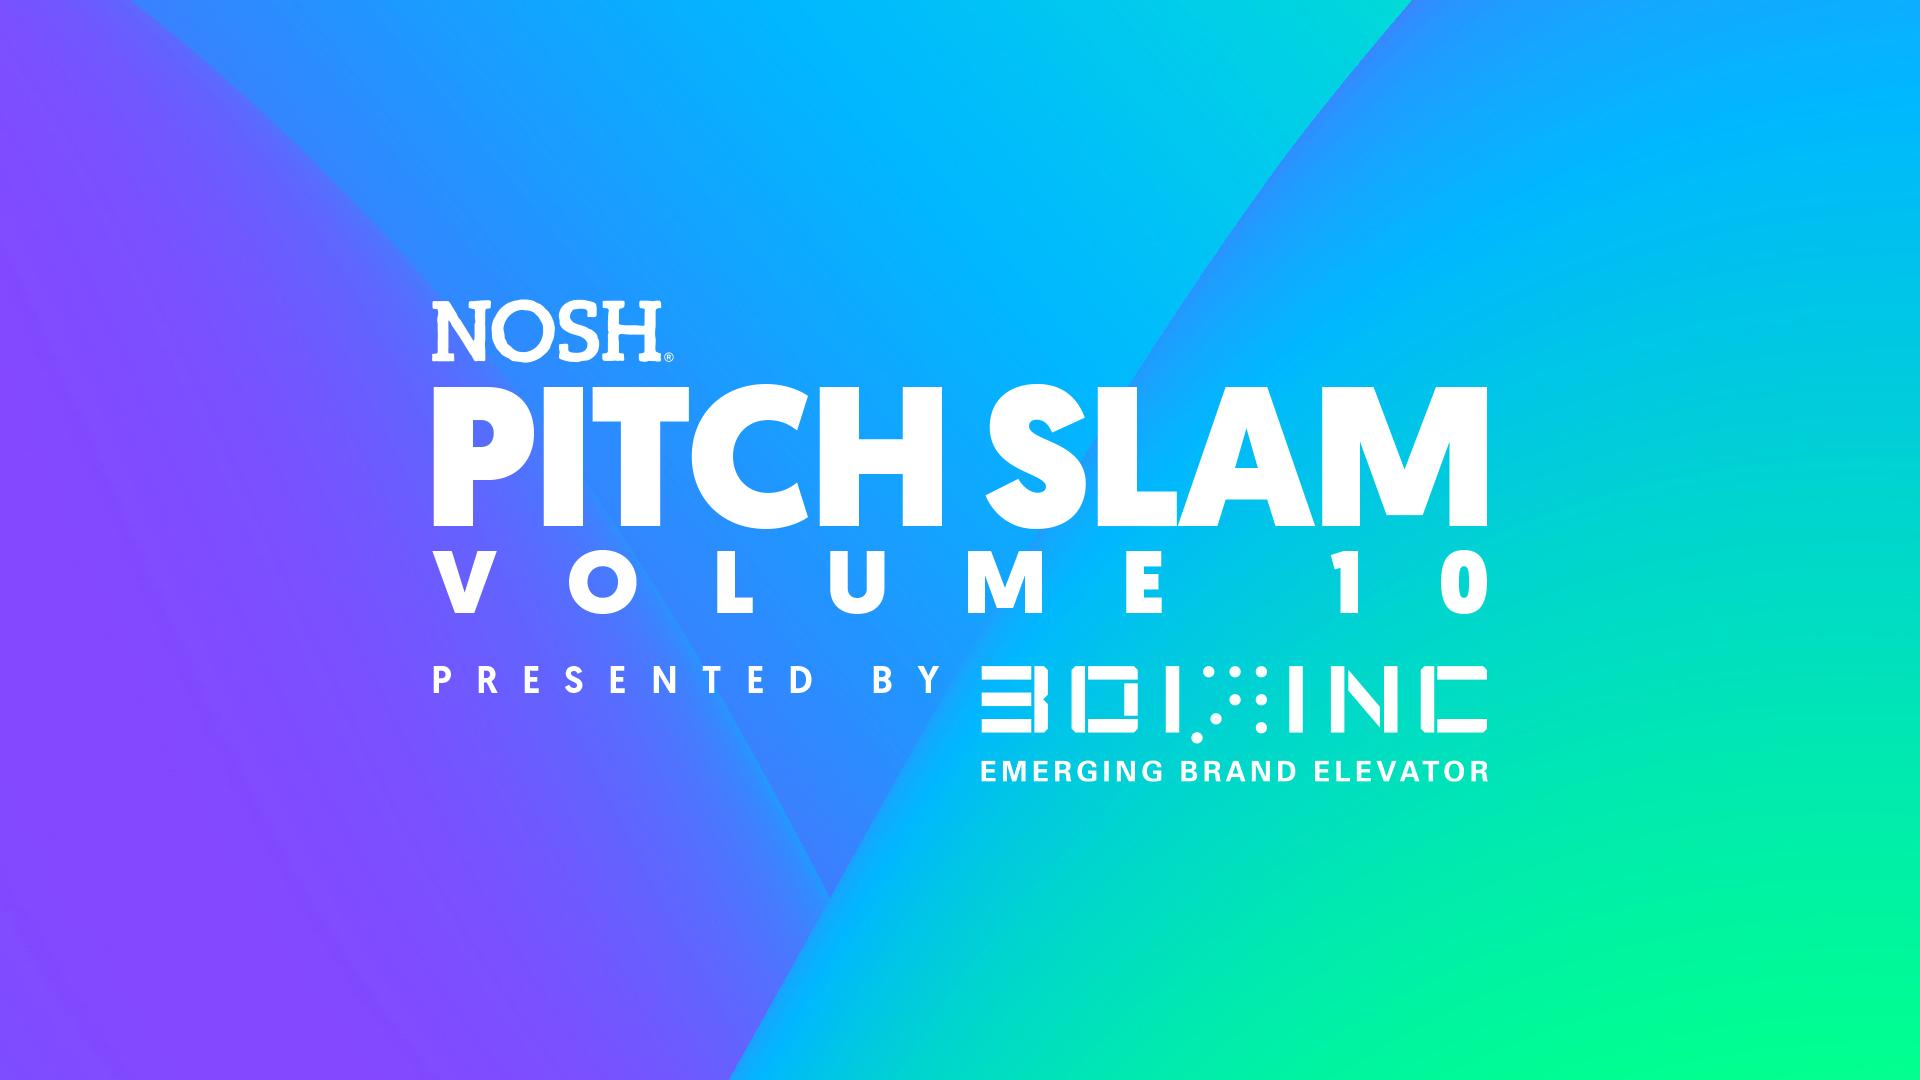 Pitch Slam Volume 10